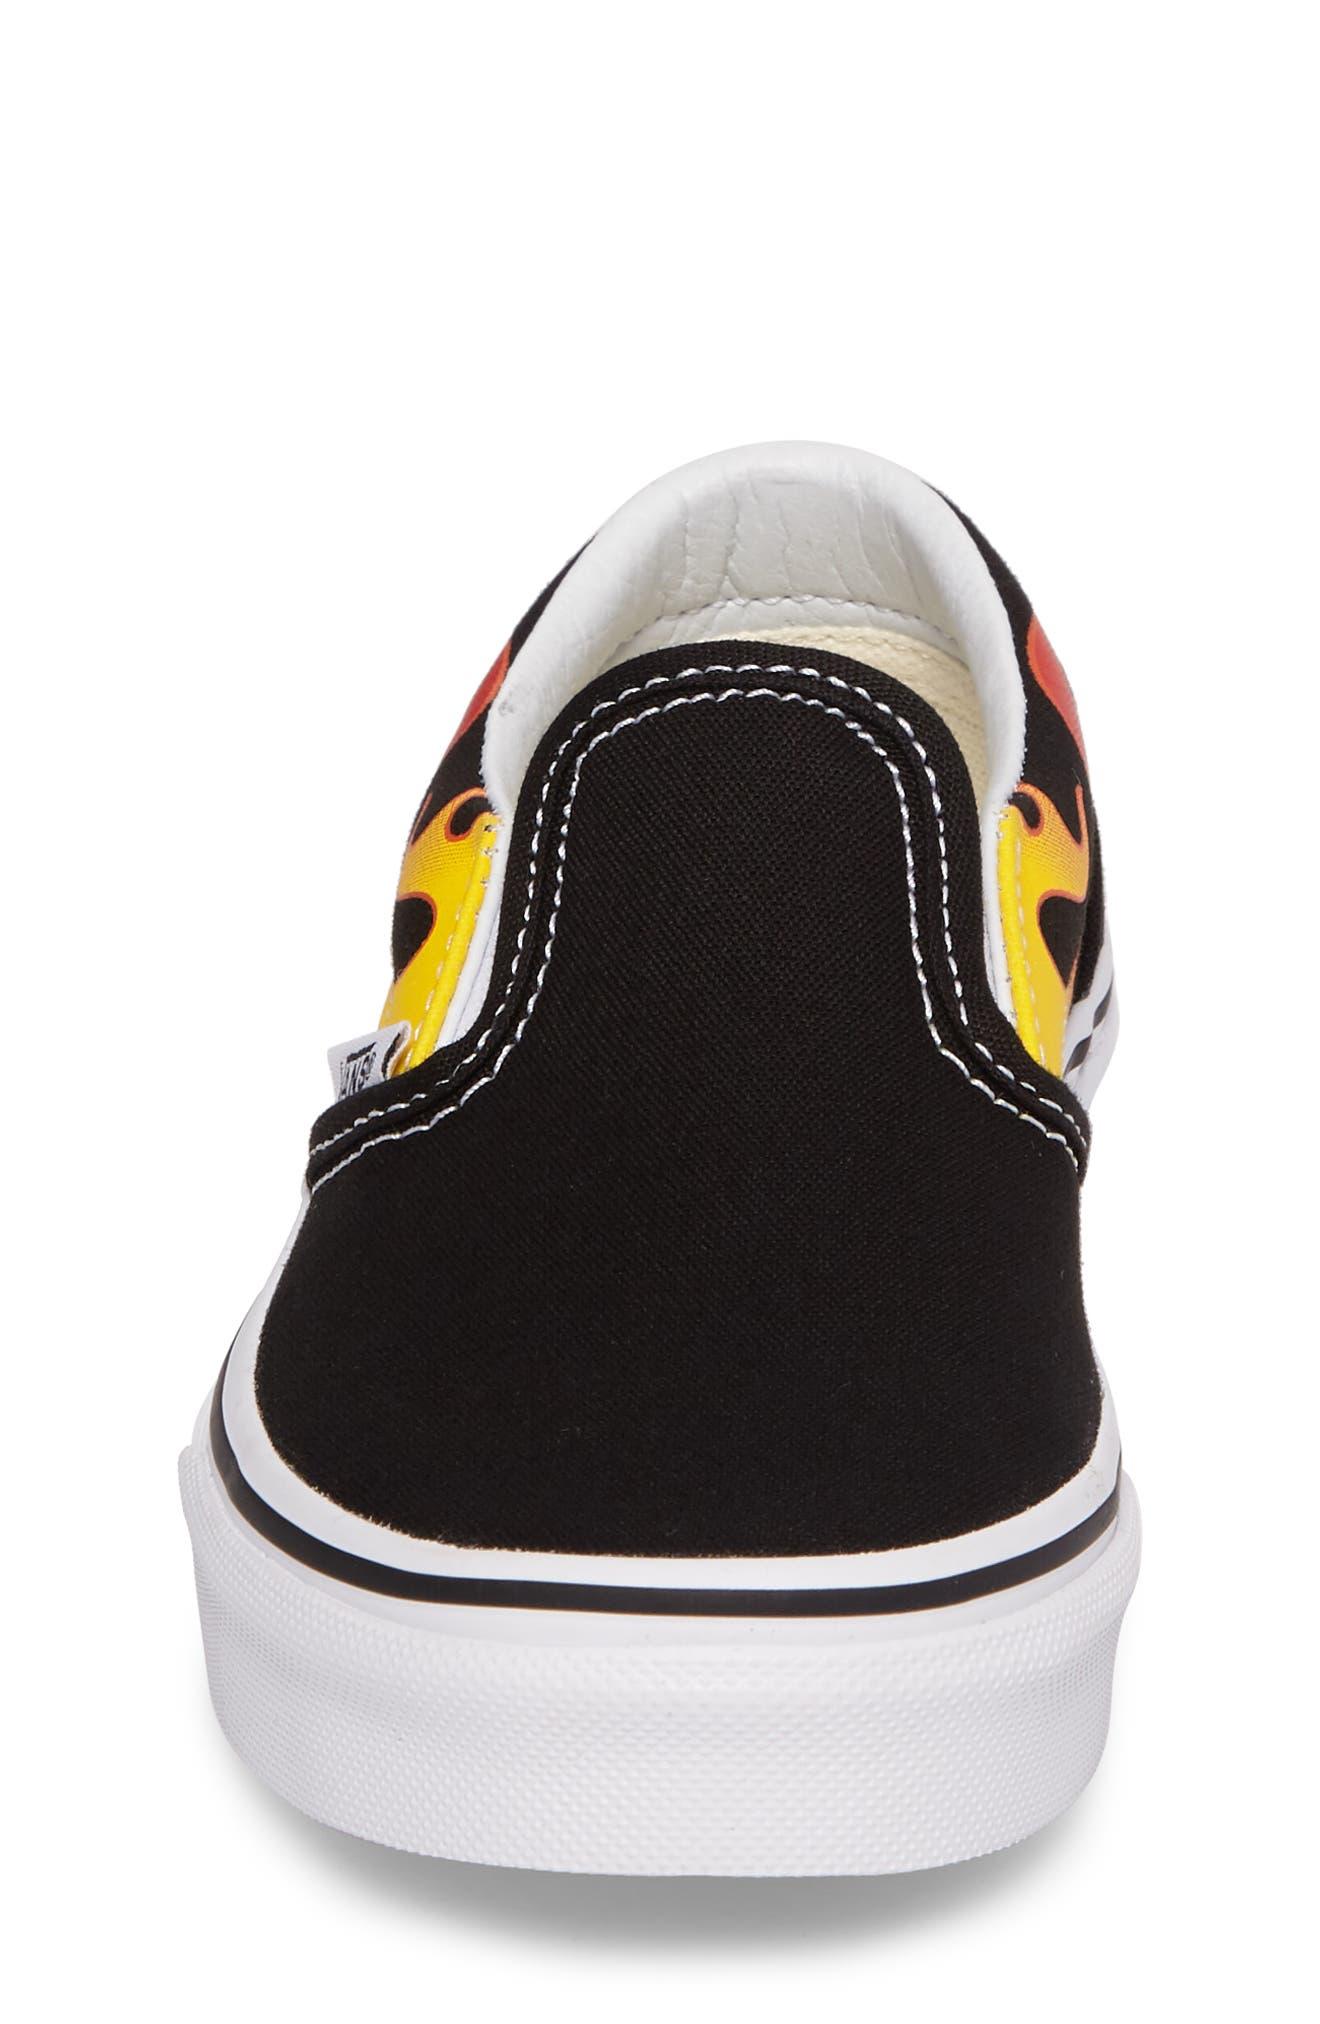 Alternate Image 4  - Vans Flame Classic Slip-On Sneaker (Toddler, Little Kid & Big Kid)